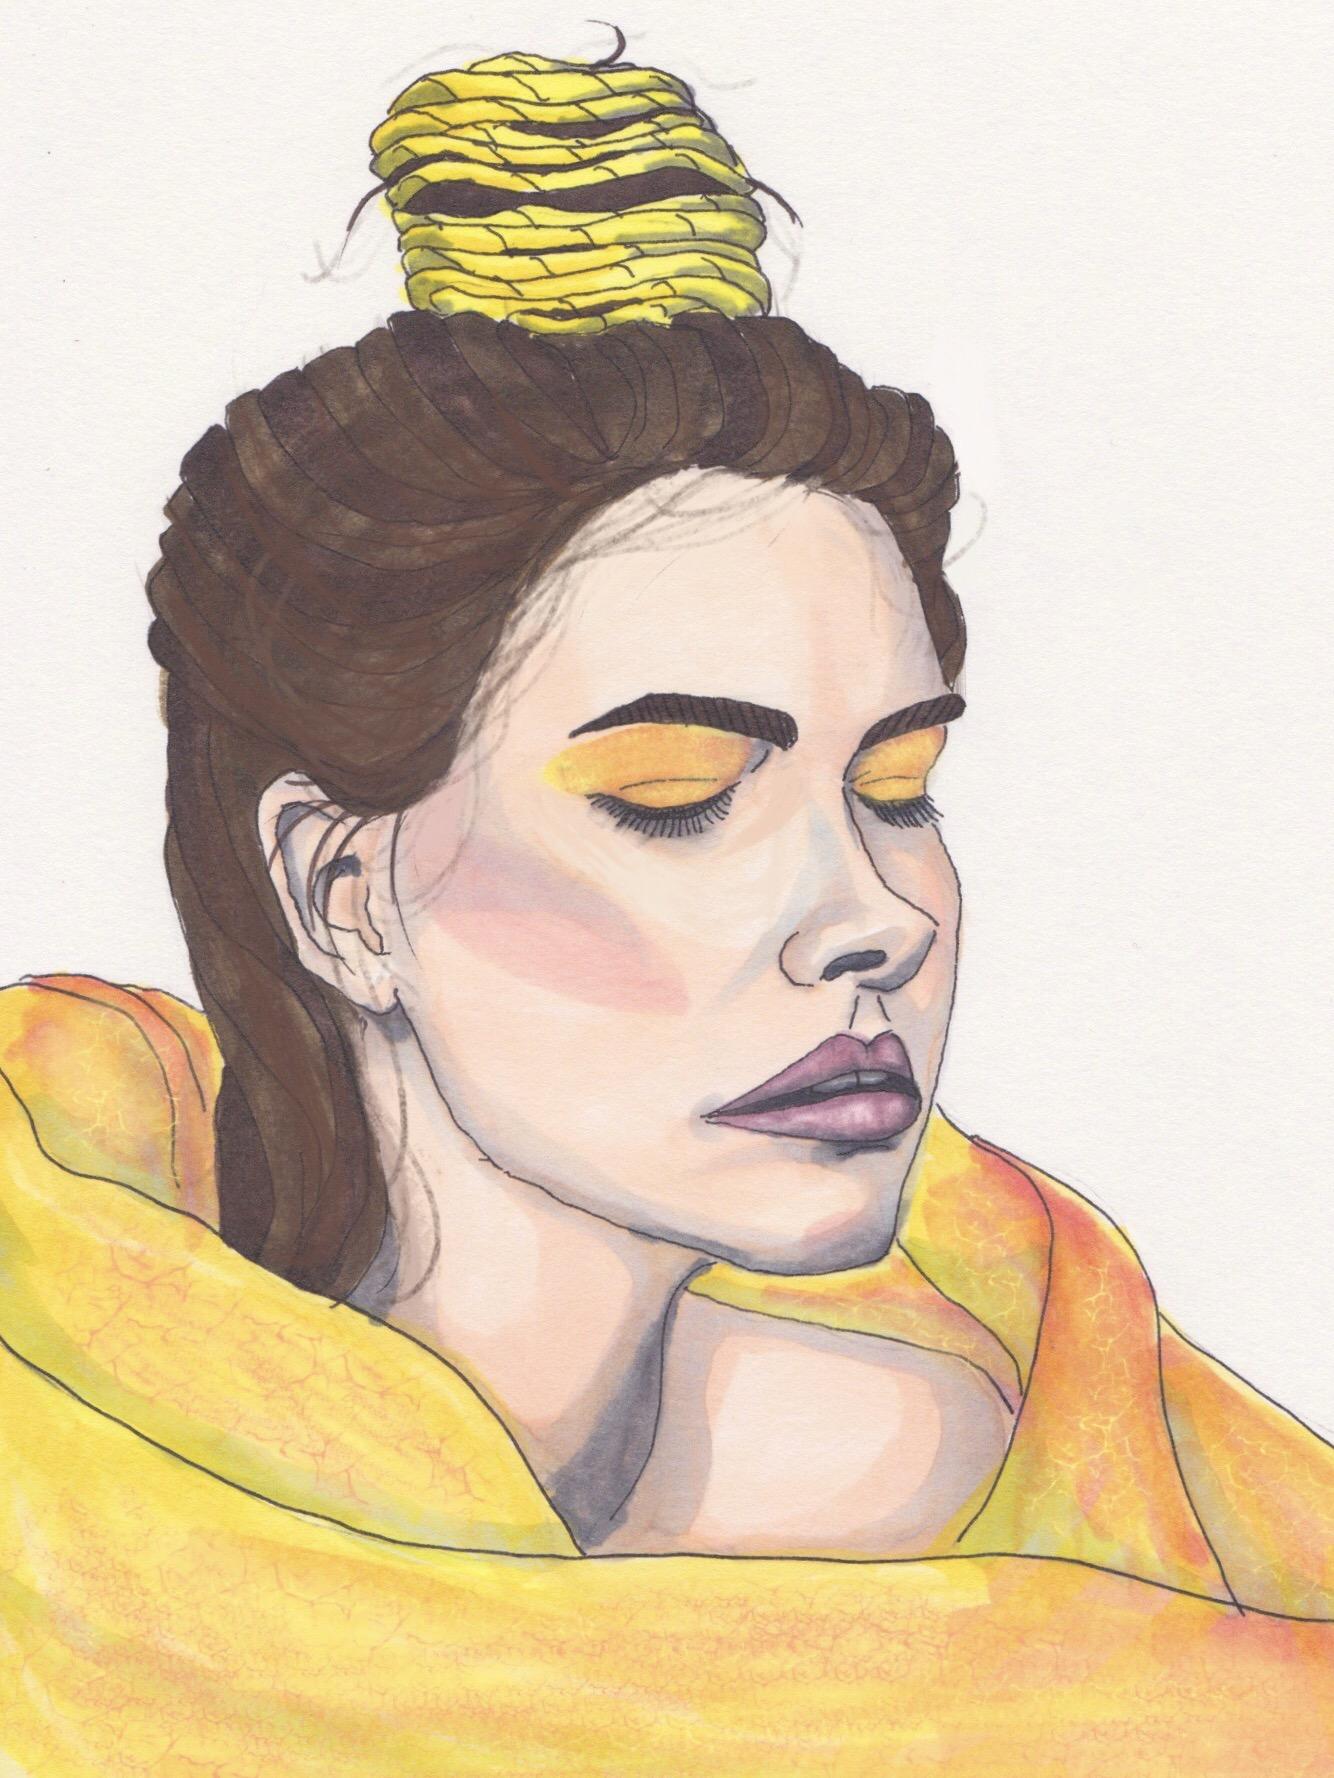 Drawn portrait digital drawing In Daler and Pro digital